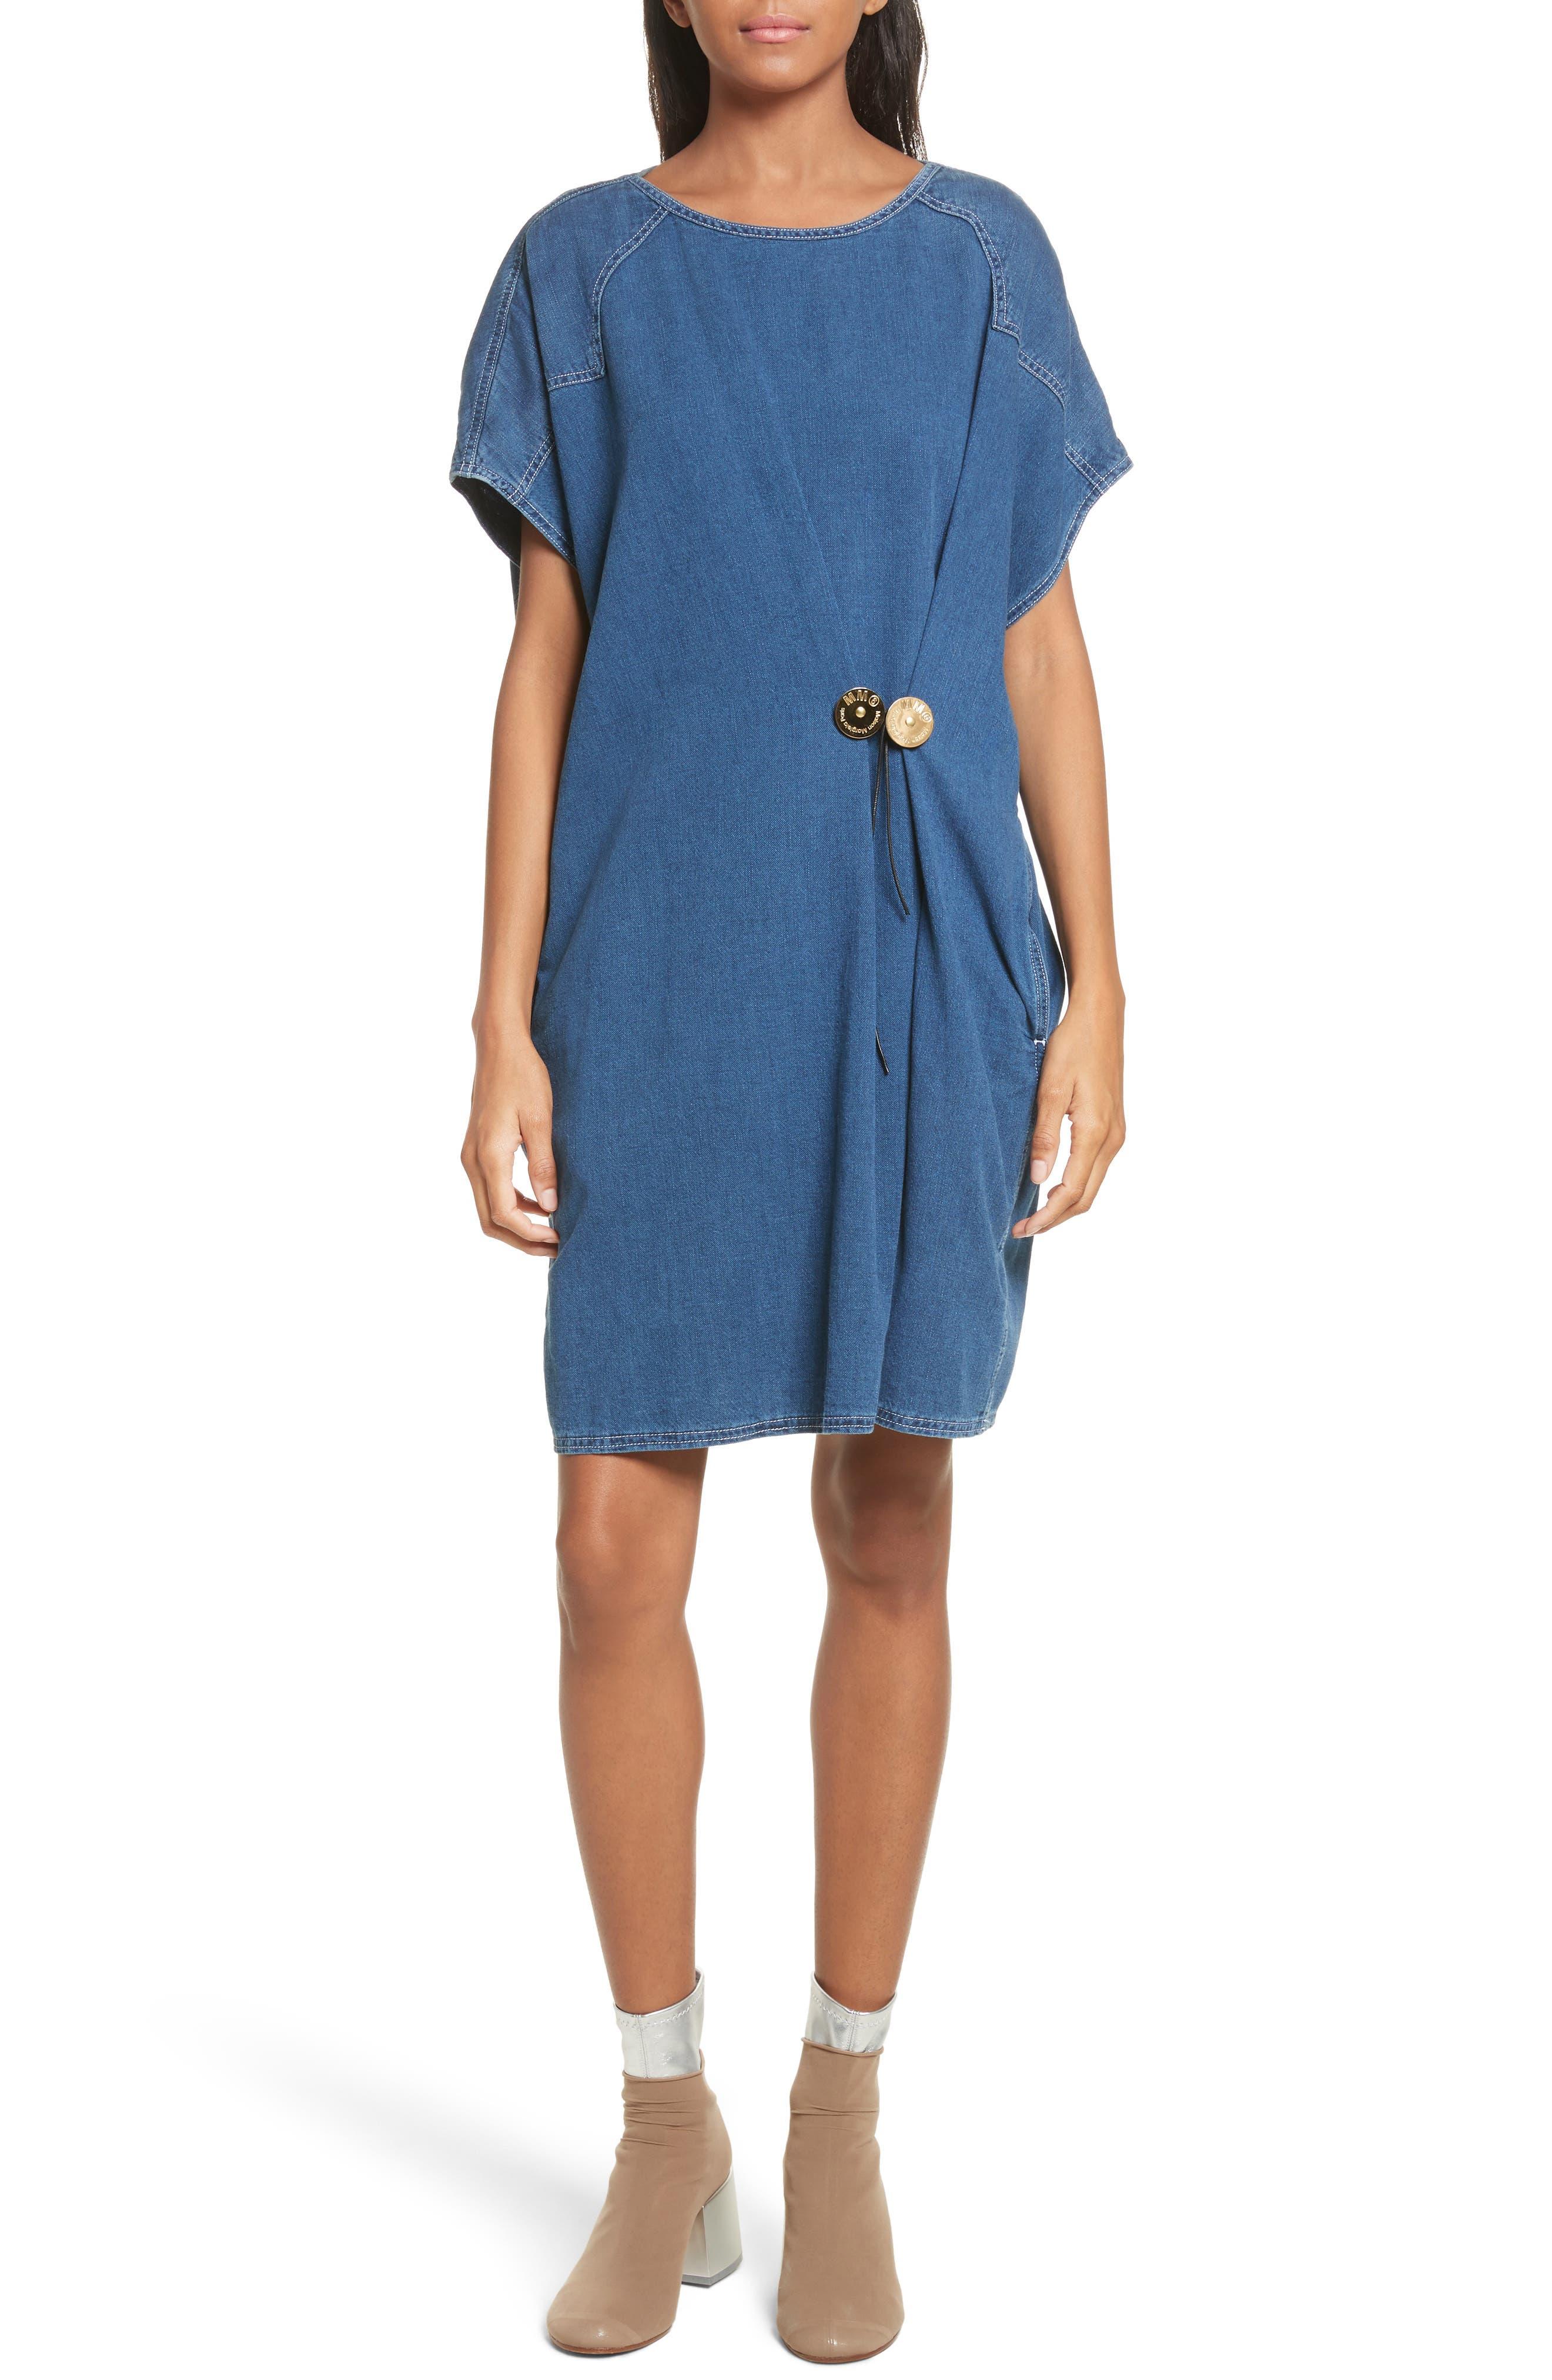 '80s Wash Denim Dress,                         Main,                         color, Medium Blue